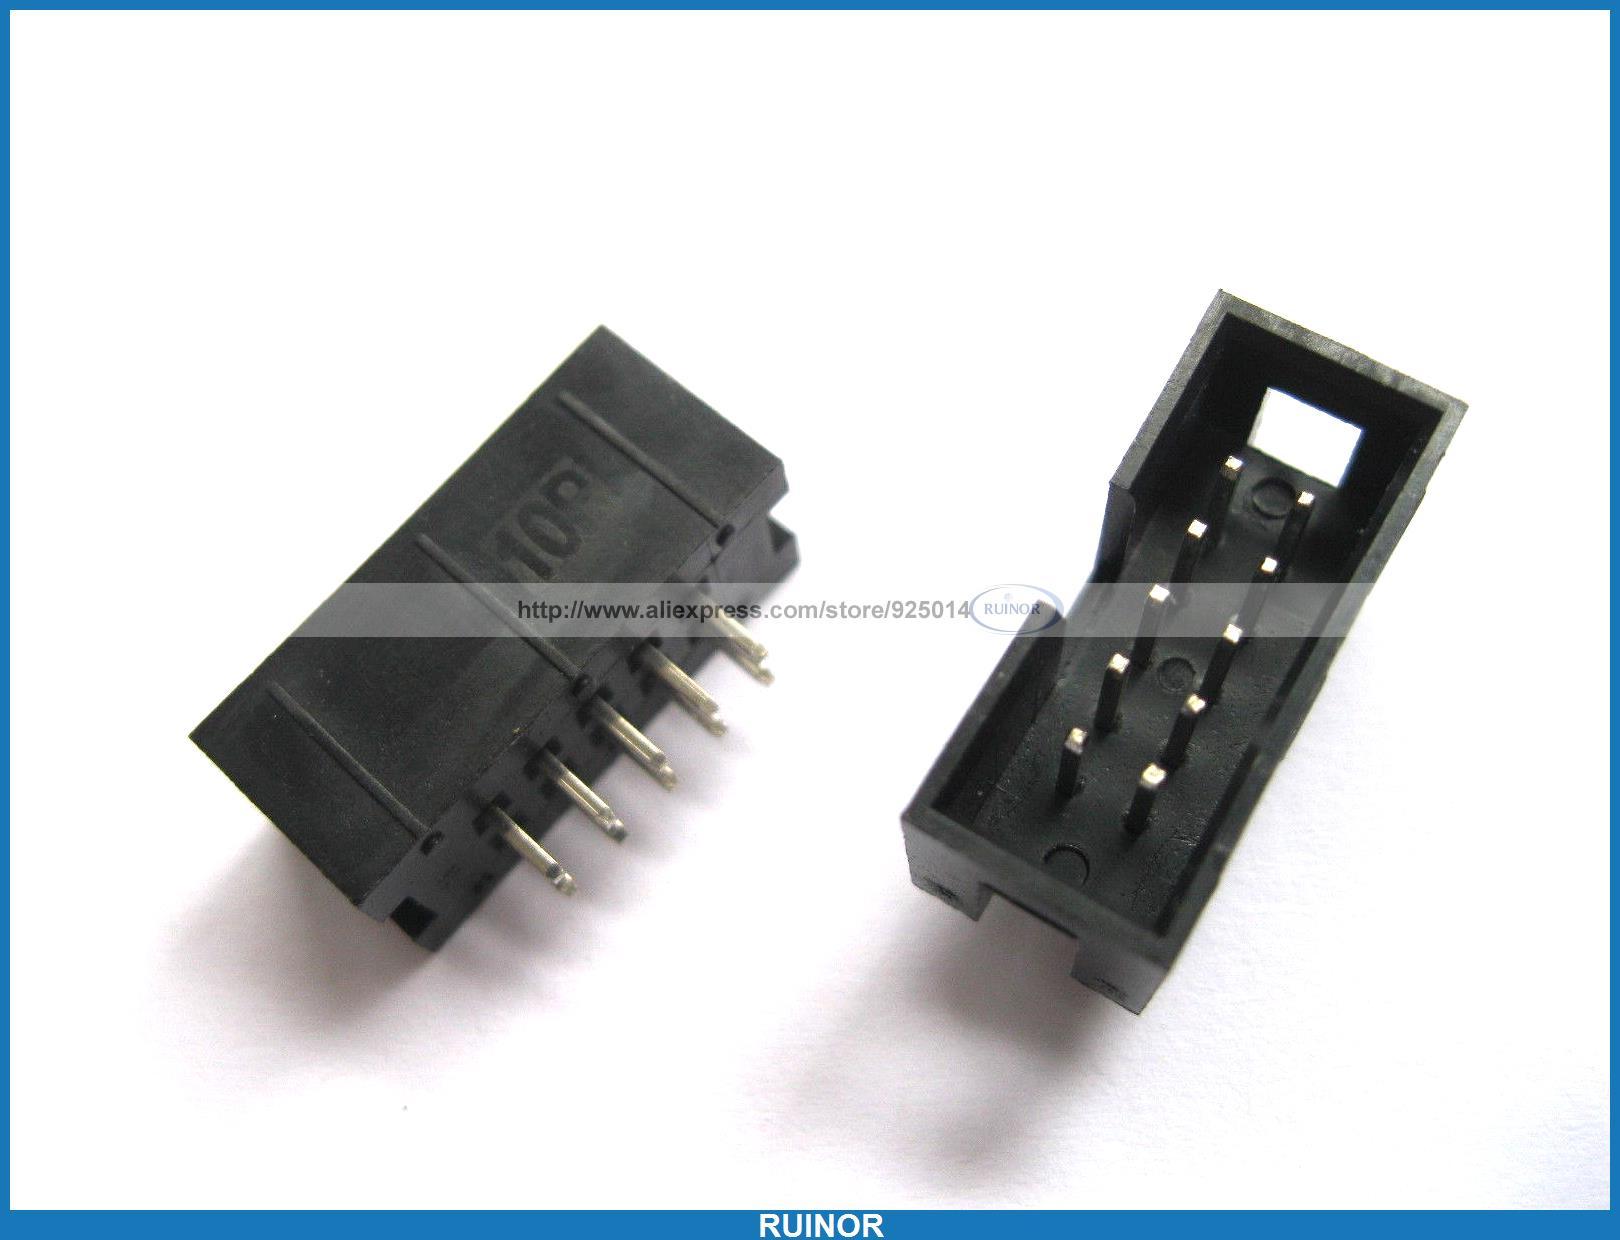 300 Pcs 10 Pin Male Box Header Connector 2.54mm New